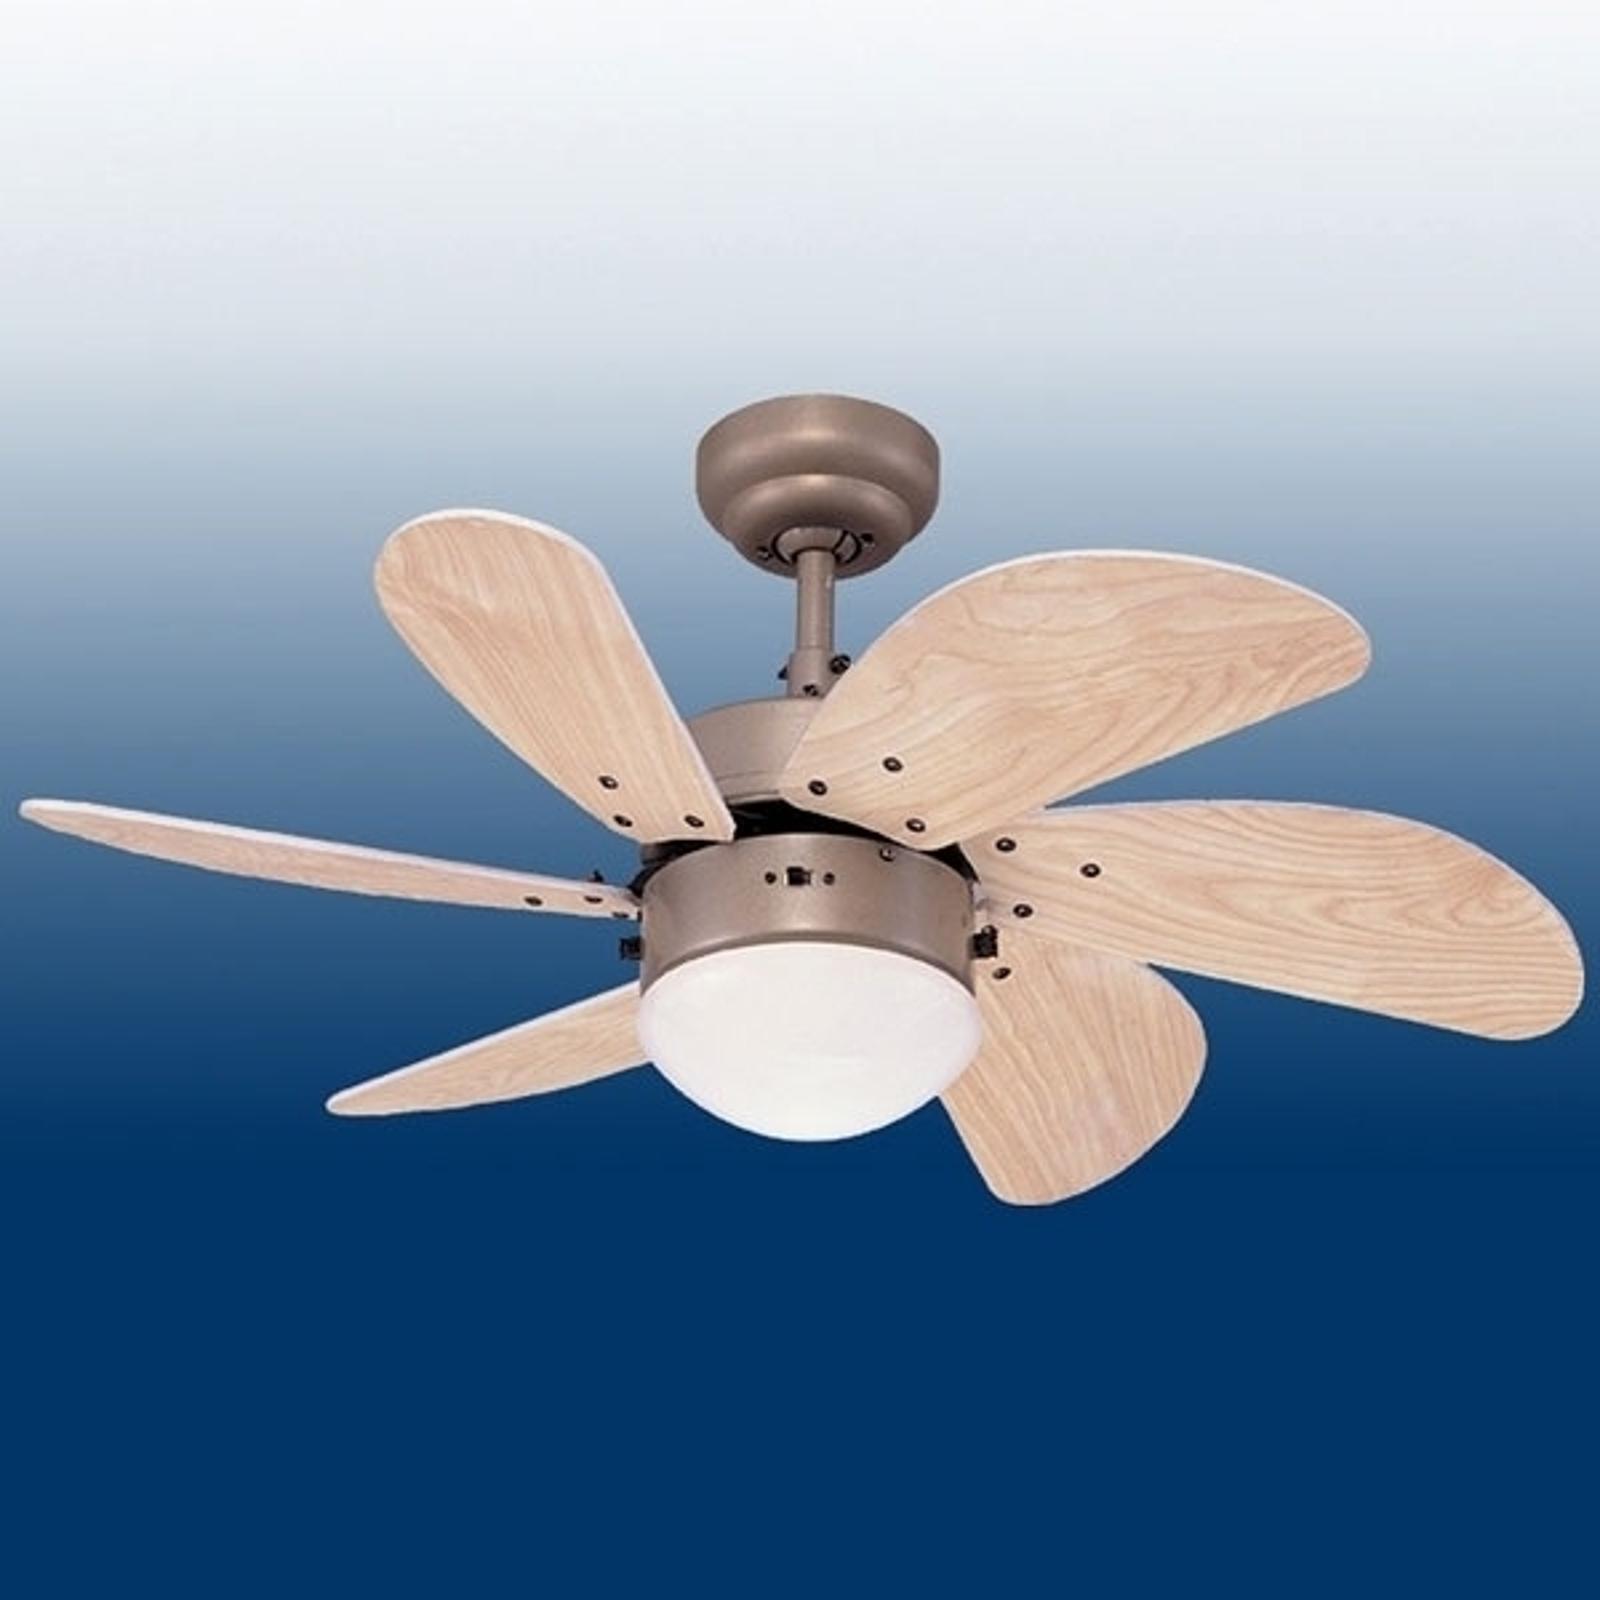 Westinghouse Turbo Swirl Ventilator m. 2 Schaltern